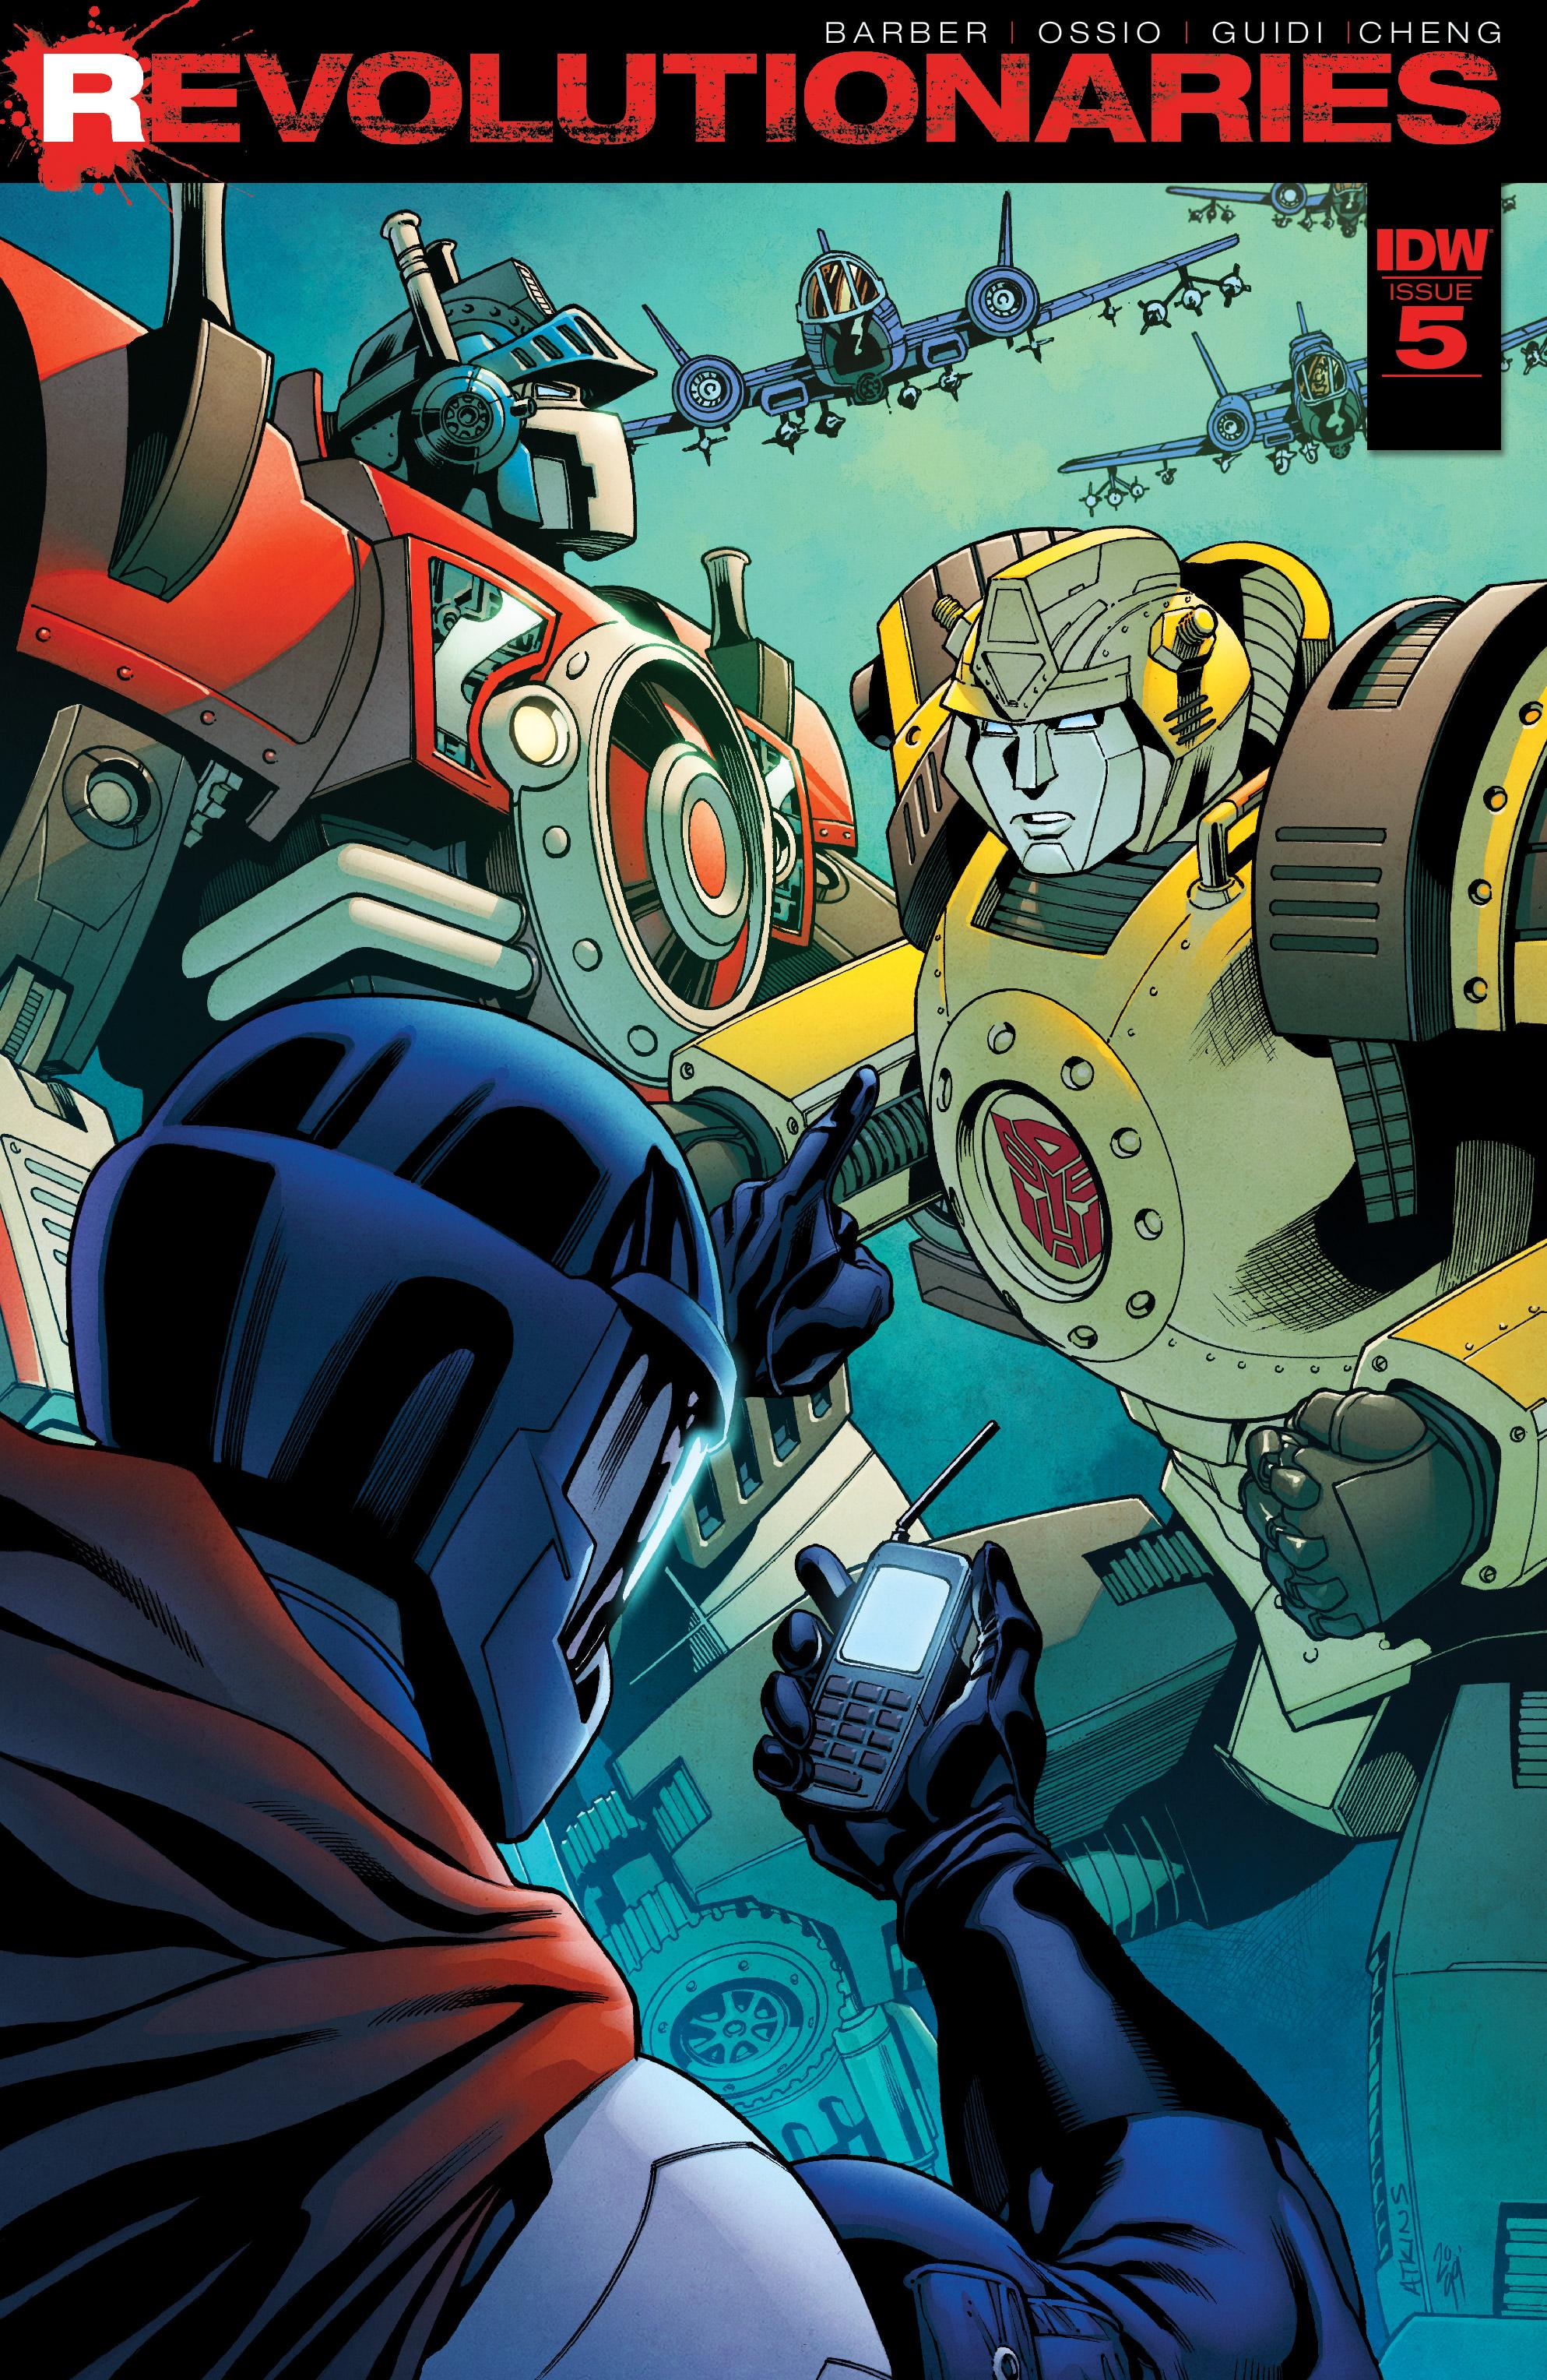 Read online Revolutionaries comic -  Issue #5 - 1